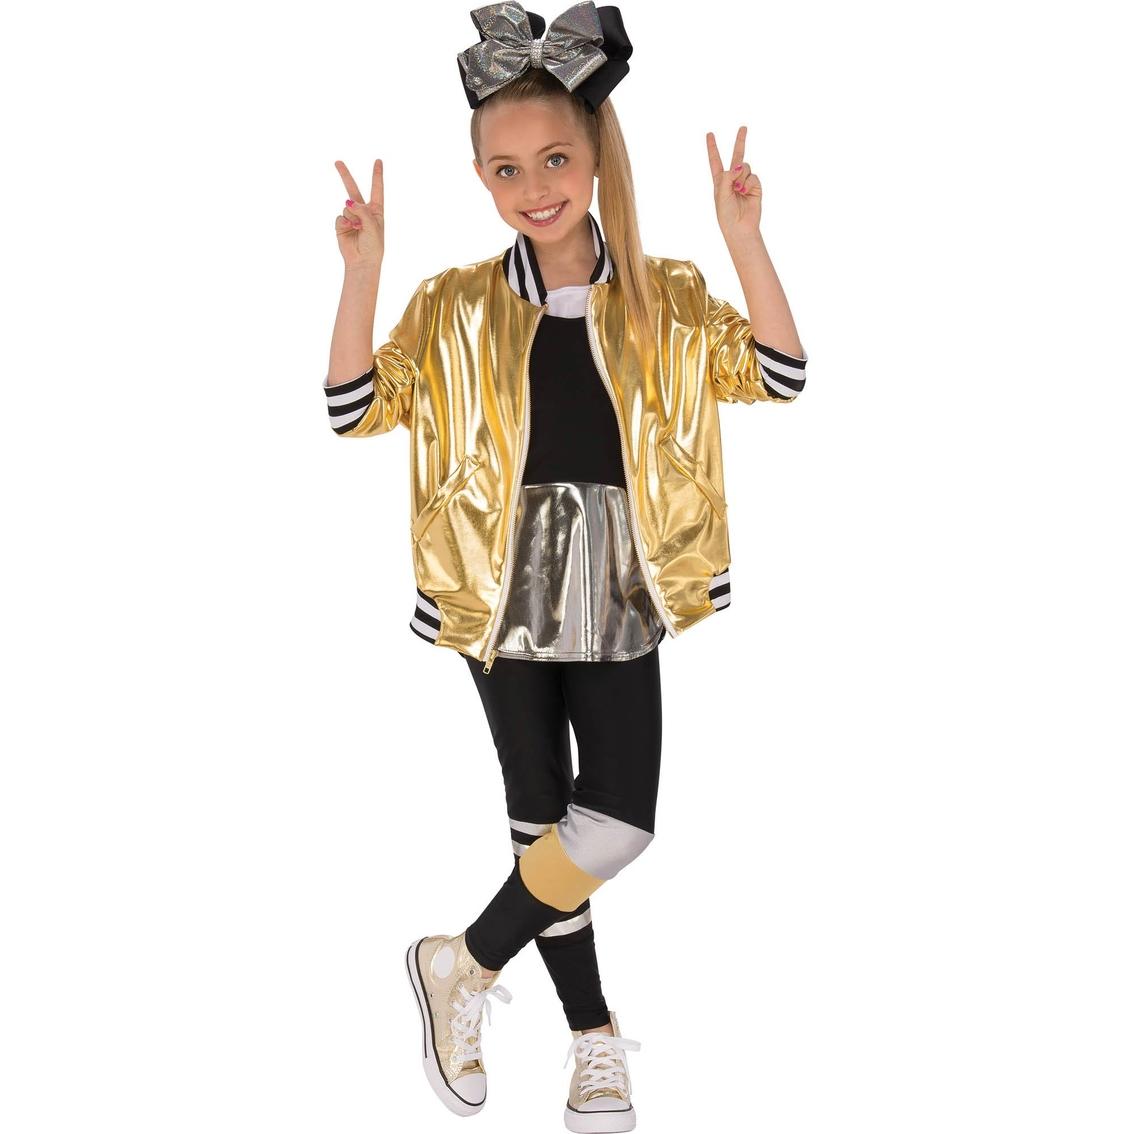 764ef4bce1d0 Rubie s Costume Little Girls   Girls Jojo Siwa Dancer Outfit Costume ...